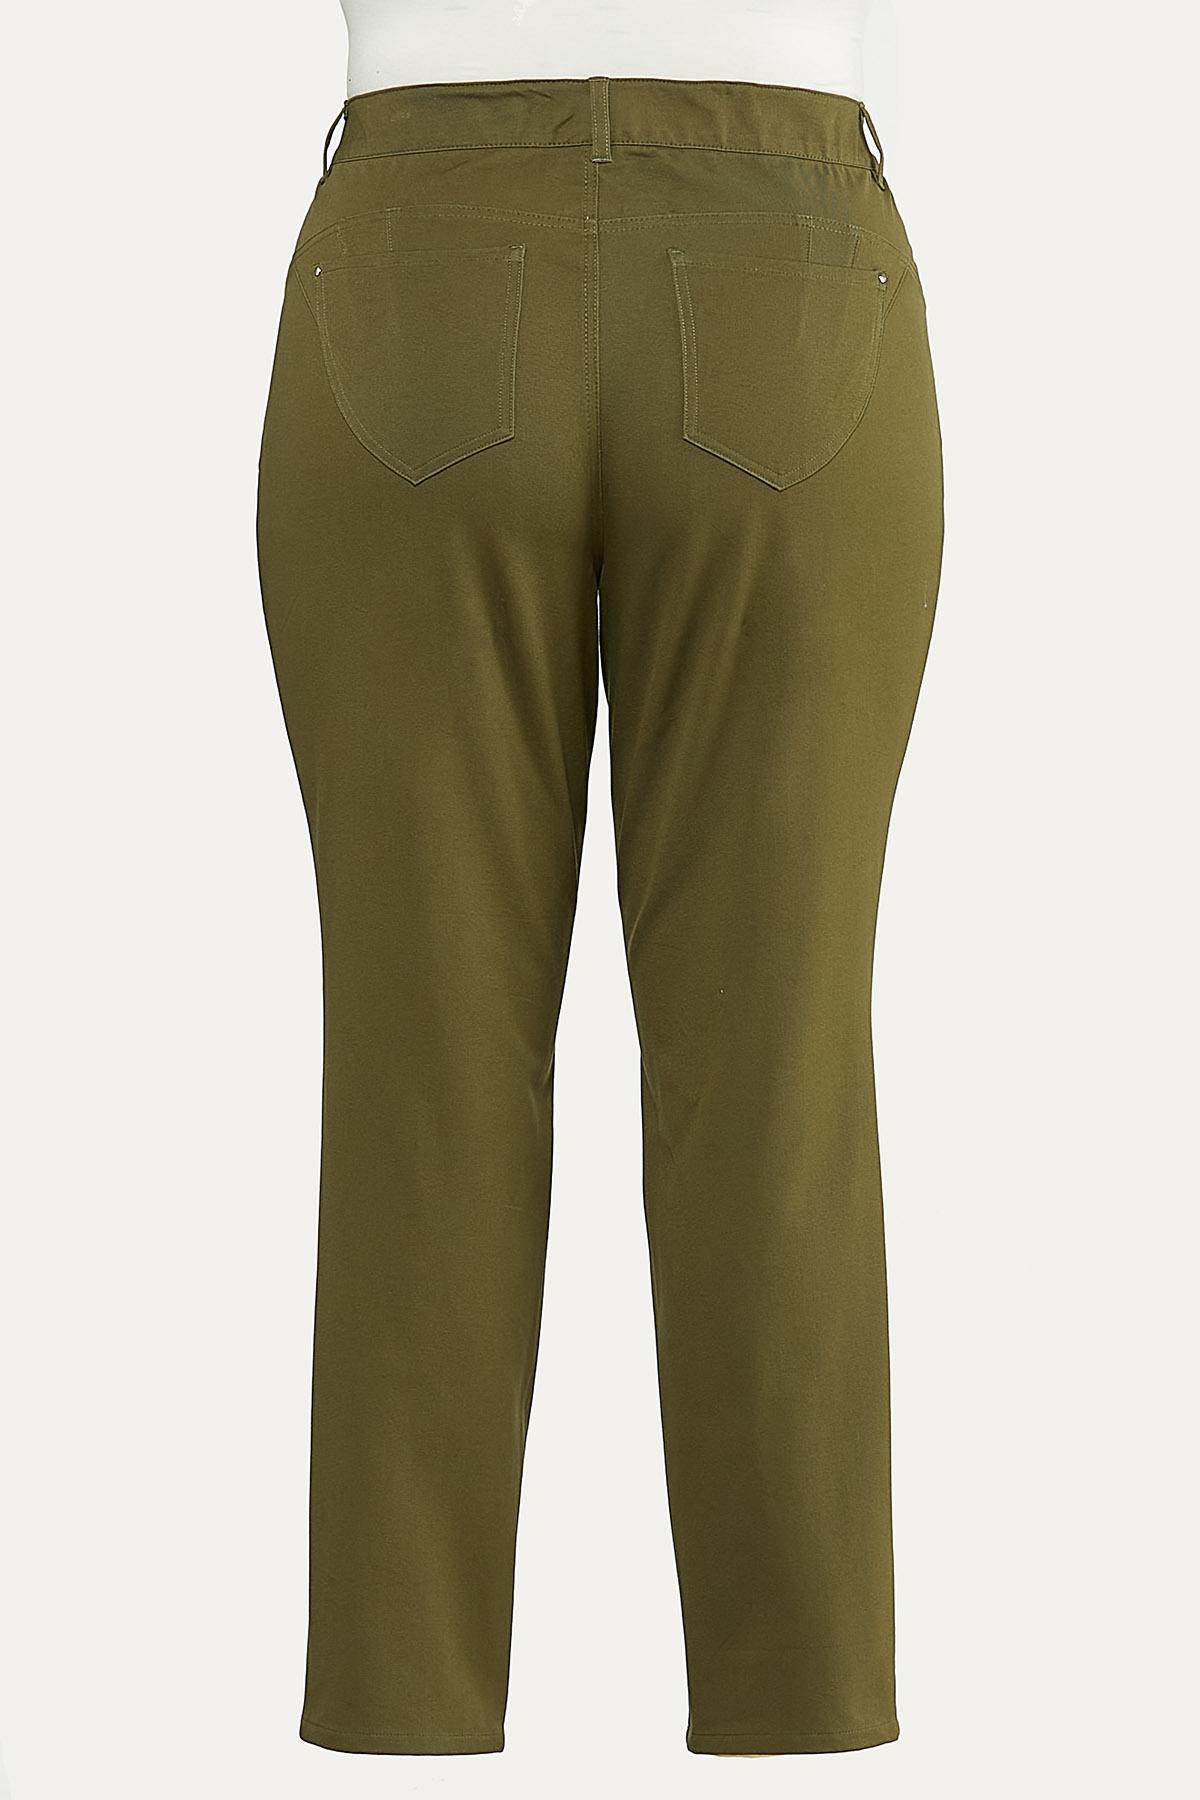 Plus Size Curvy Getaway Pants (Item #44658710)